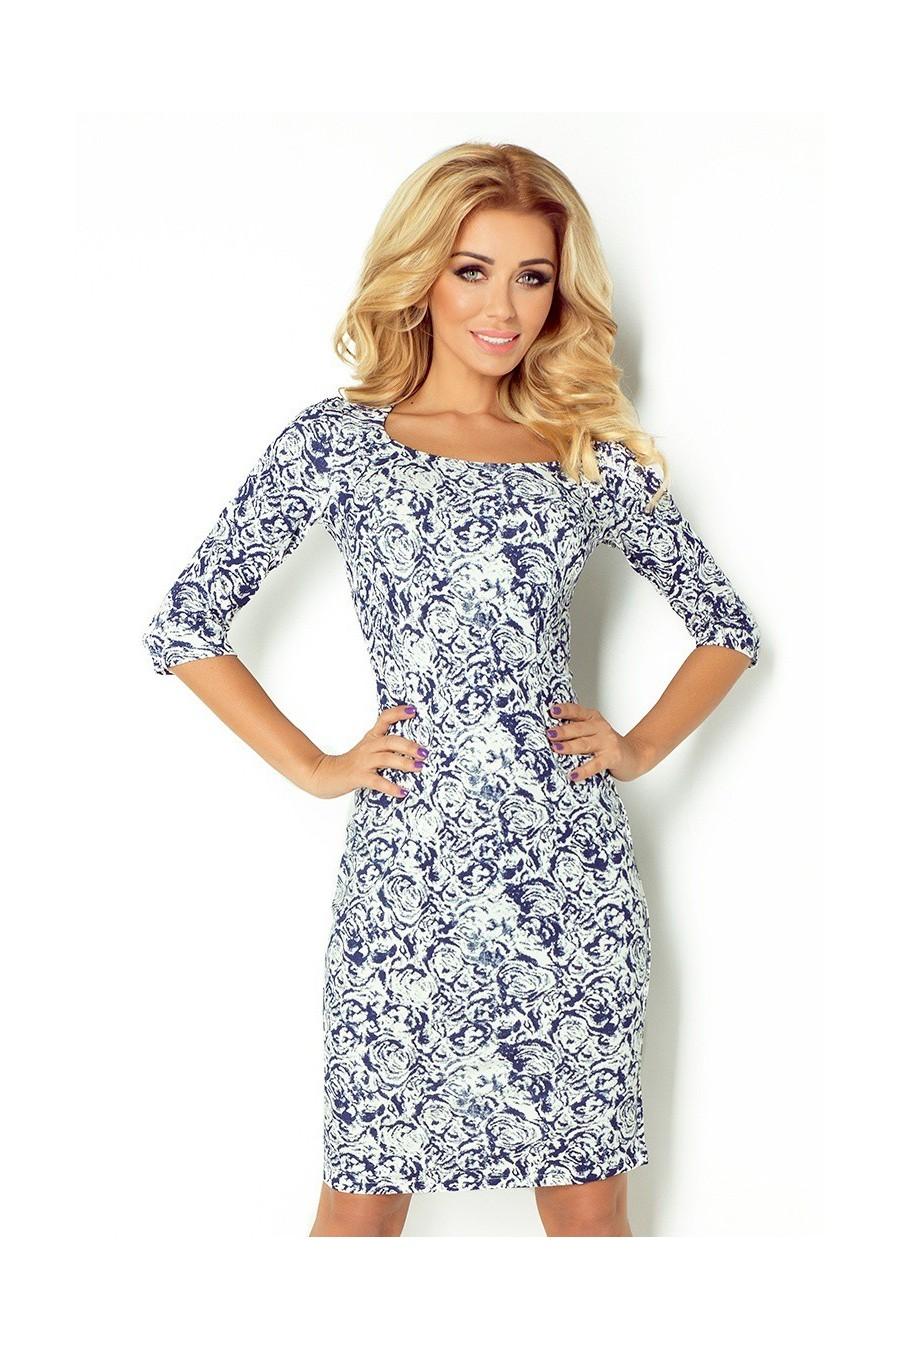 748cfca9e0c8 Dámske šaty s rukávom 2487 - Spoločenské šaty Online